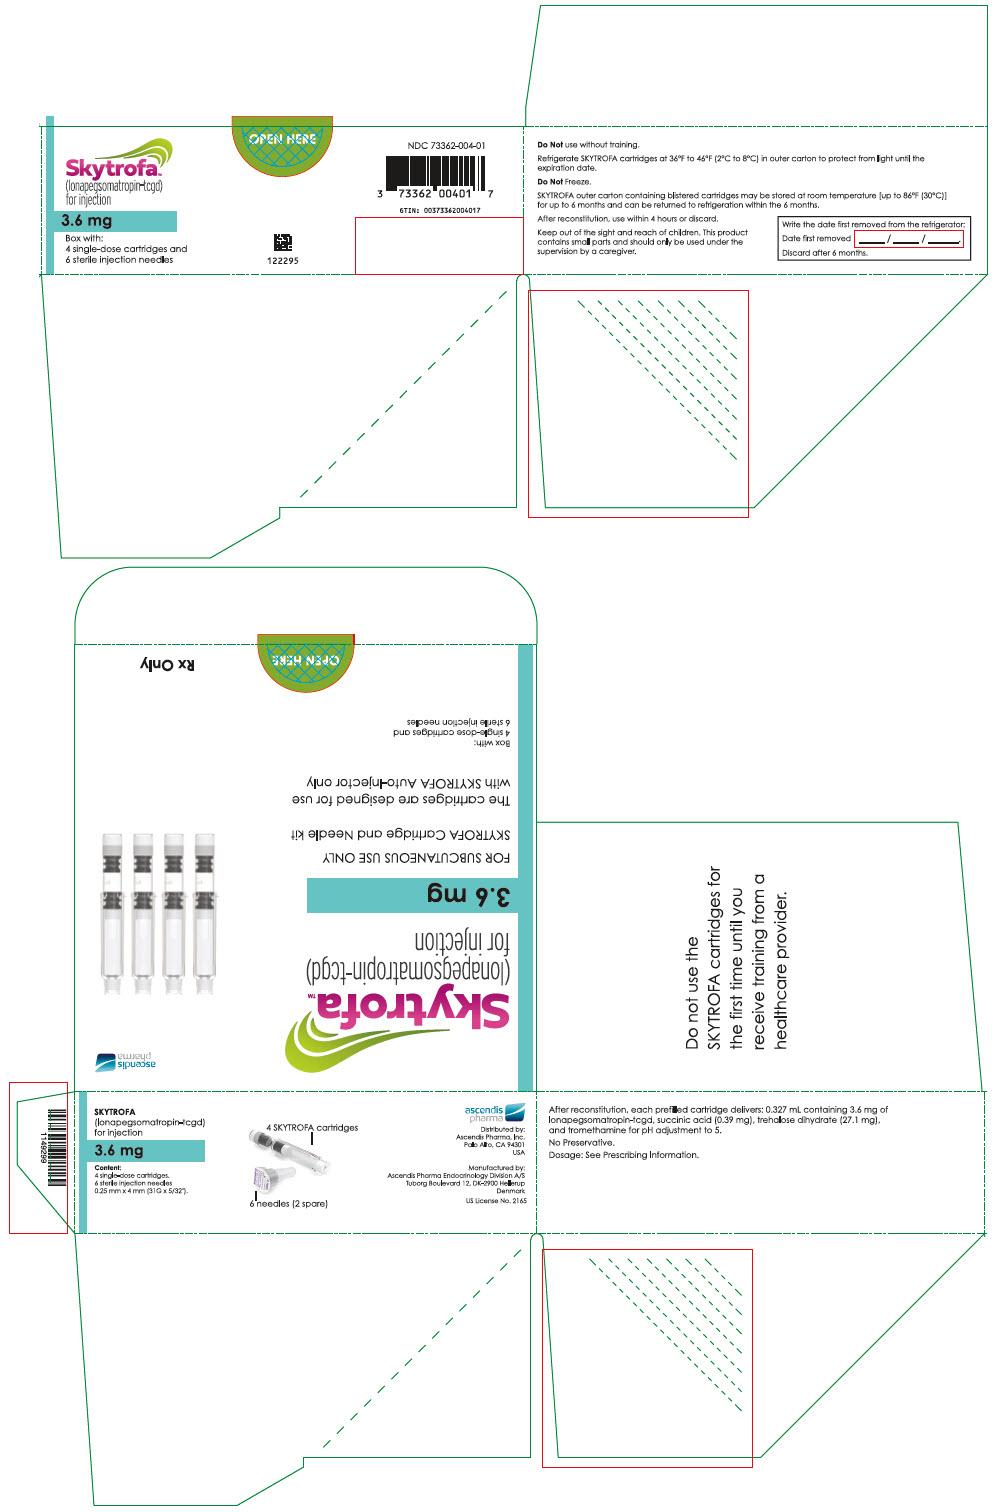 PRINCIPAL DISPLAY PANEL - 3.6 mg Cartridge Blister Pack Carton